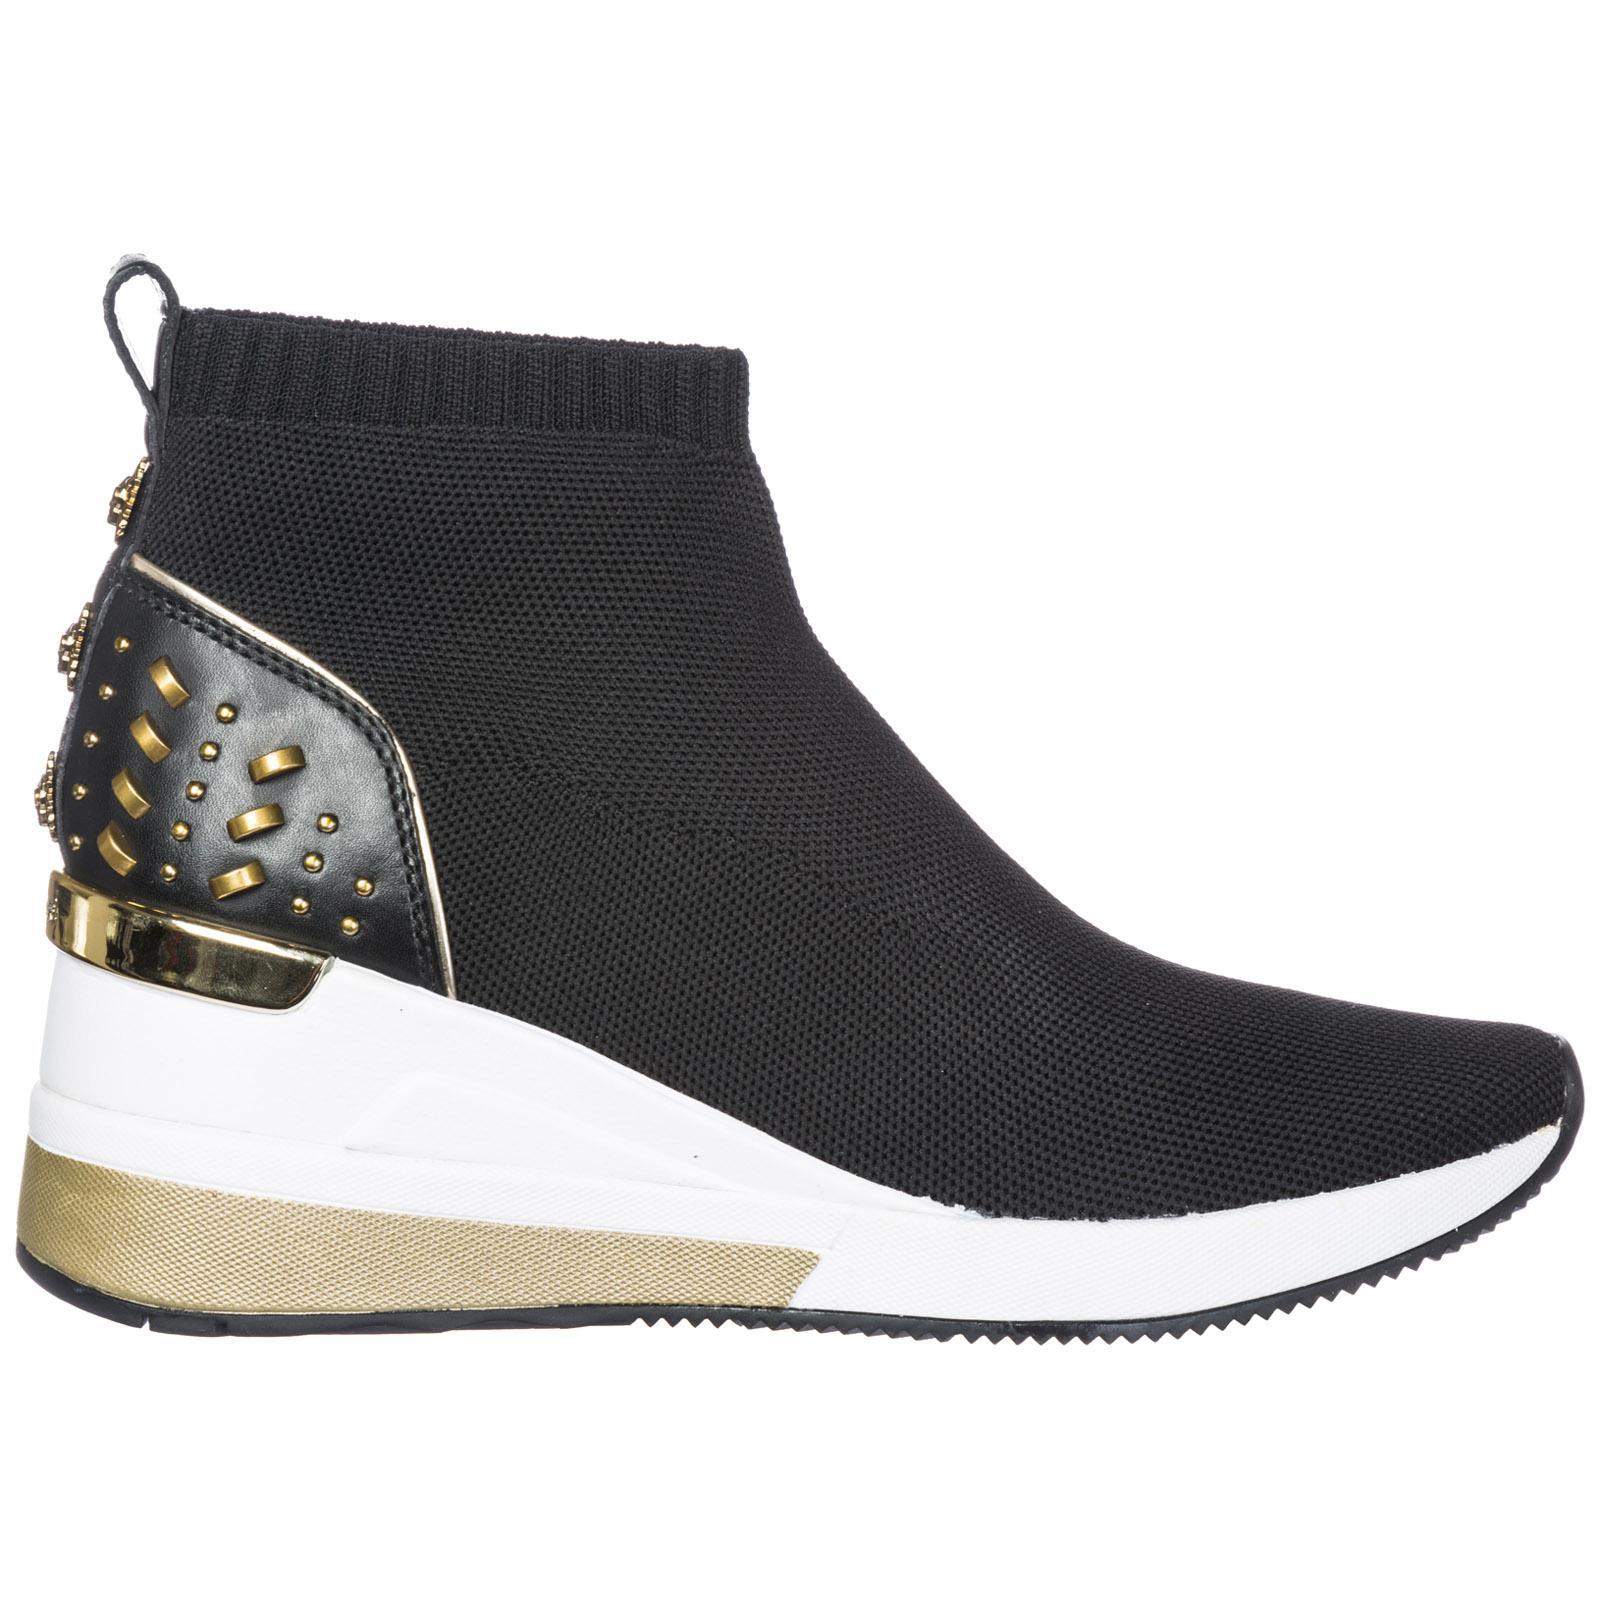 d7c69d5f6b8c Michael Kors Slip On Sneakers Skyler in Black - Lyst